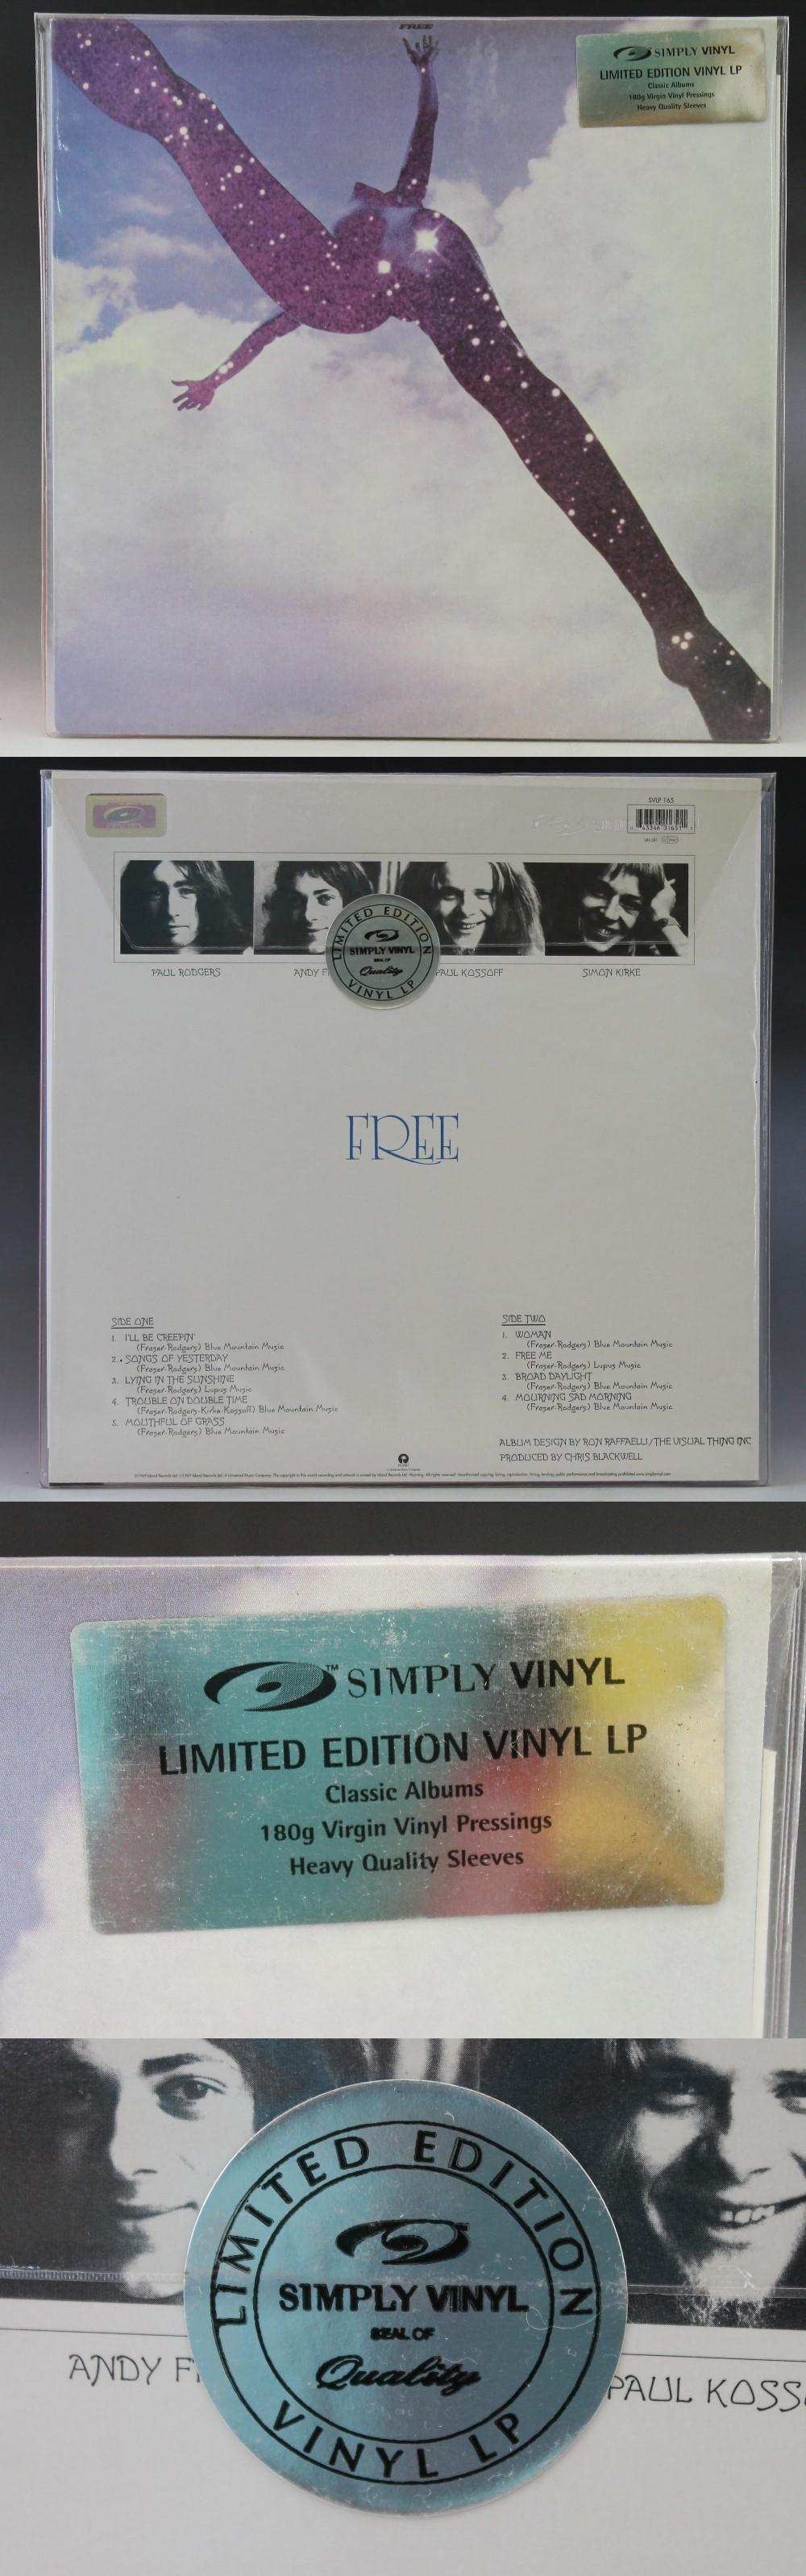 003FREE・ FREE 1969 ISLAND